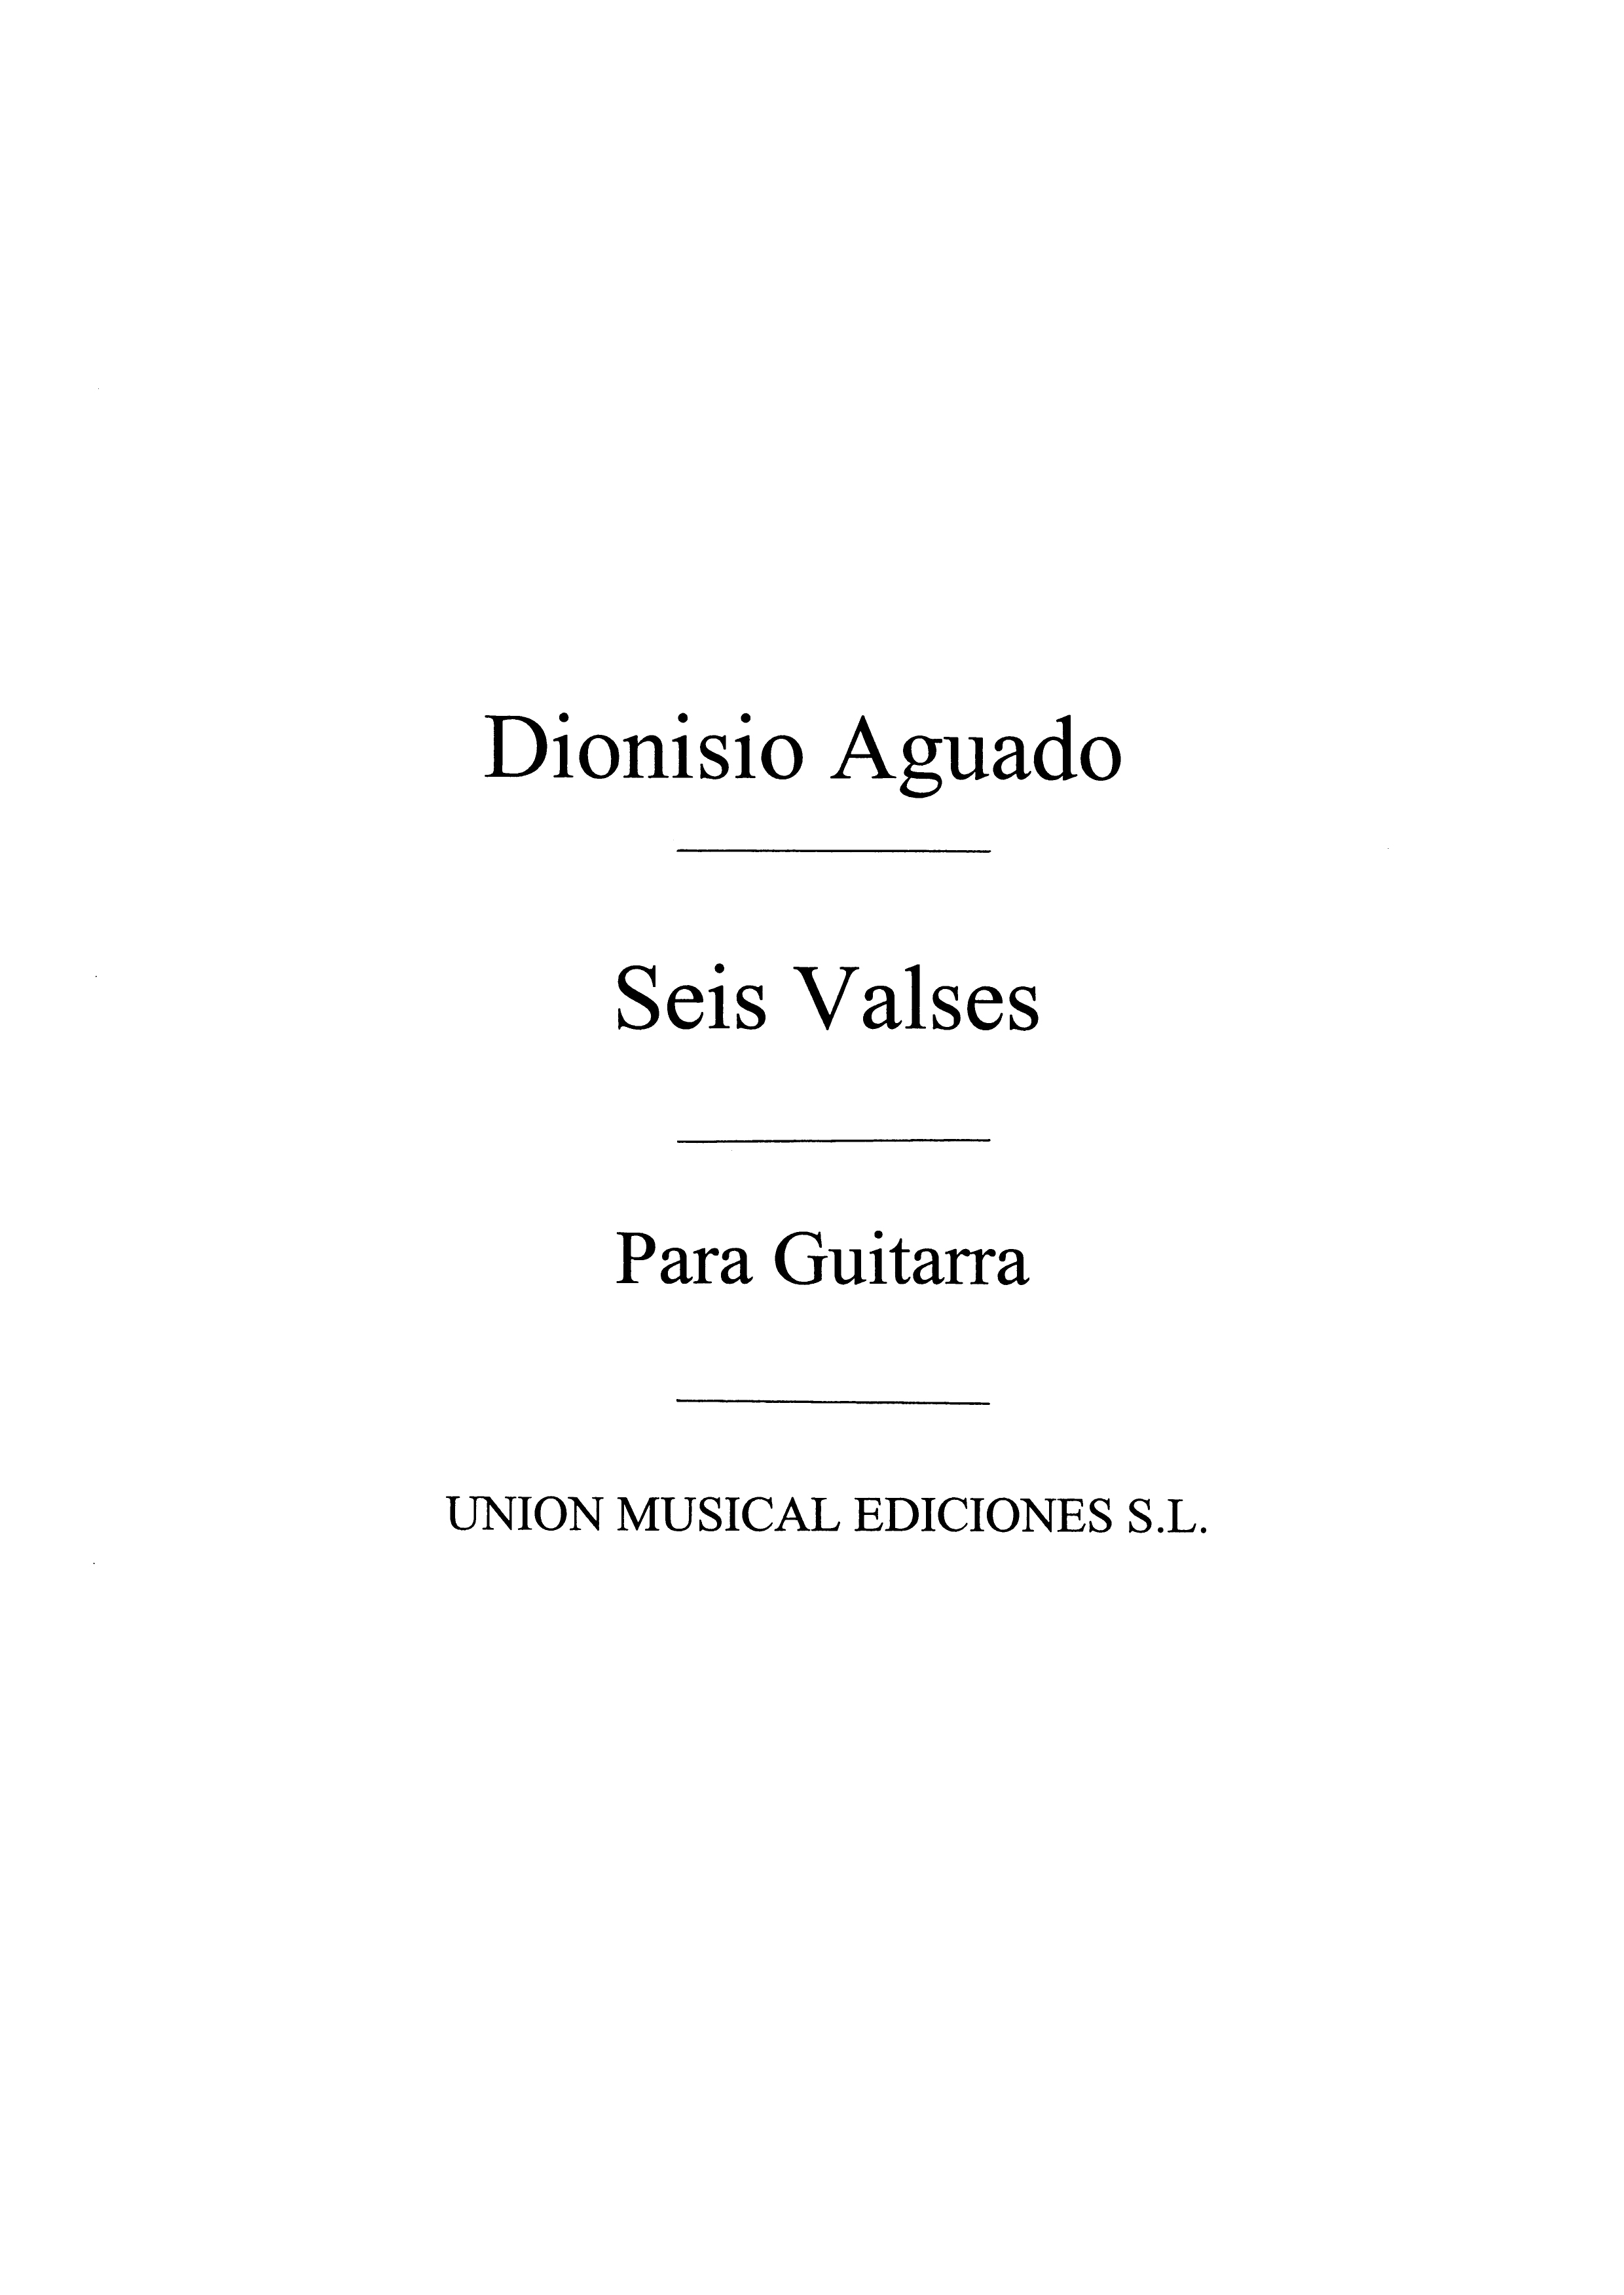 Dionisio Aguado: Seis Valses: Guitar: Instrumental Work